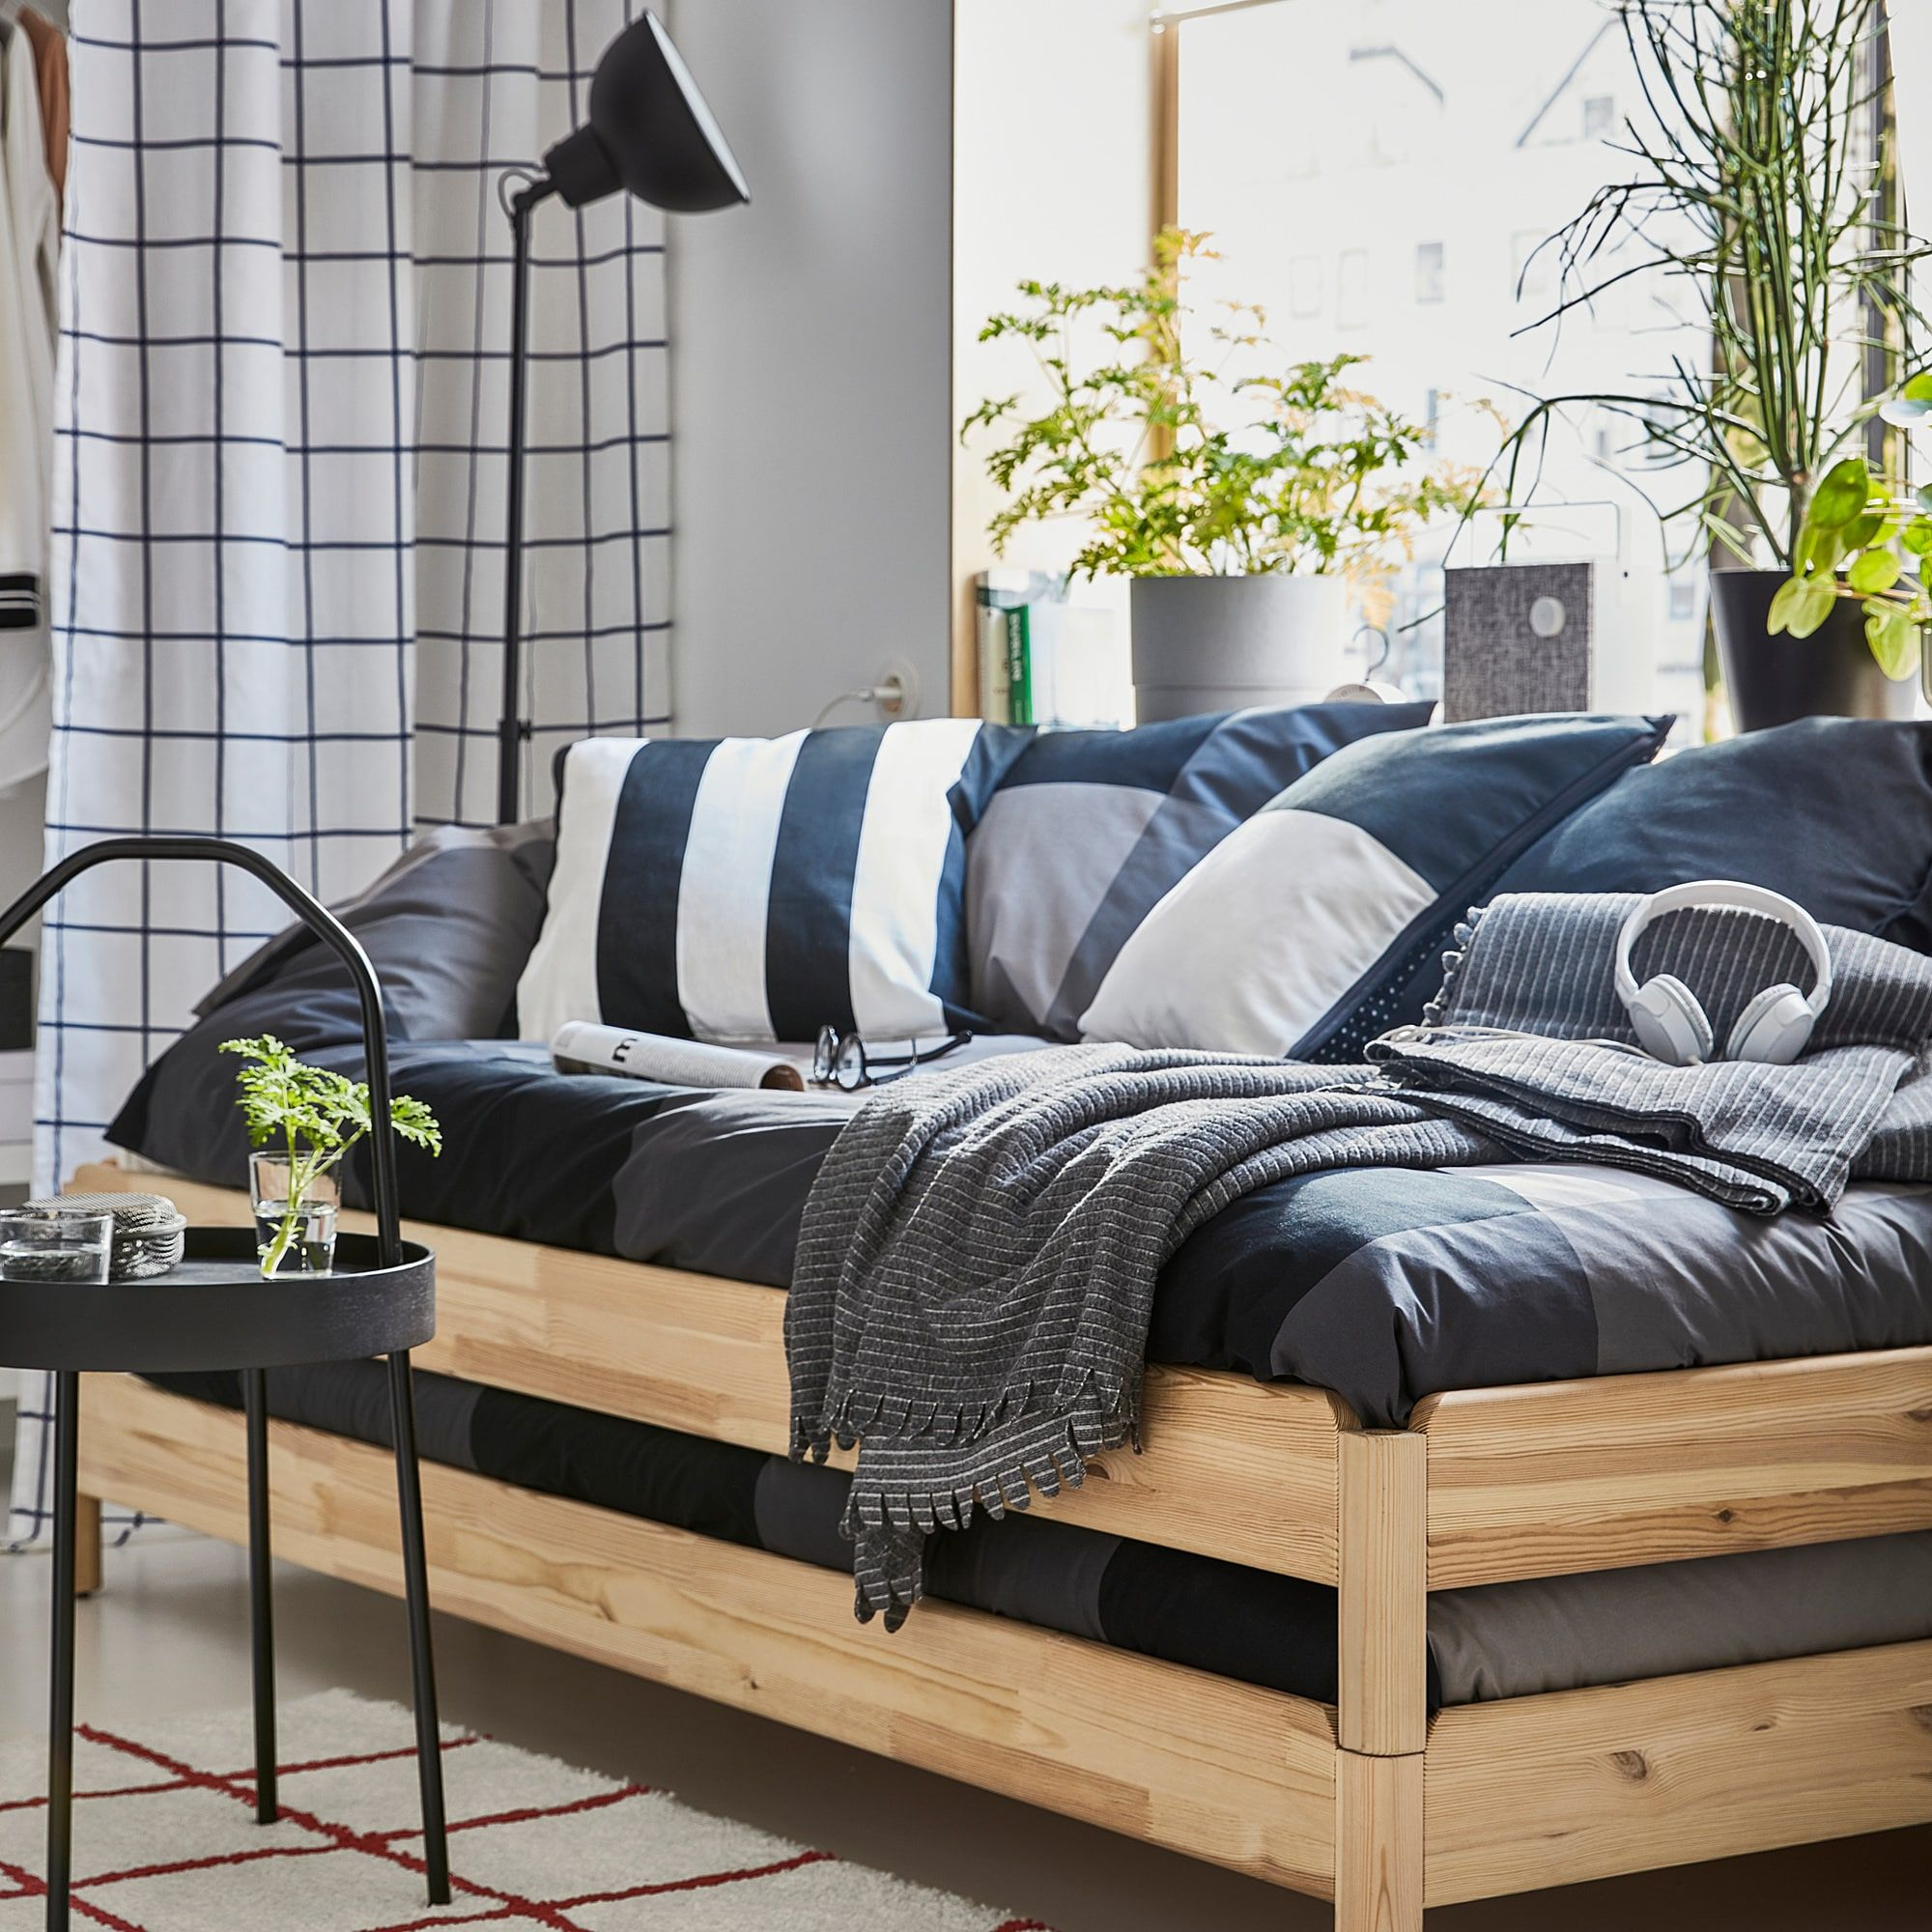 Utaker Stapelbaar Bed Met 2 Matrassen Grenen Husvika Stevig 80x200 Cm Ikea In 2020 Dorm Room Furniture Spare Bed Furniture For Small Spaces